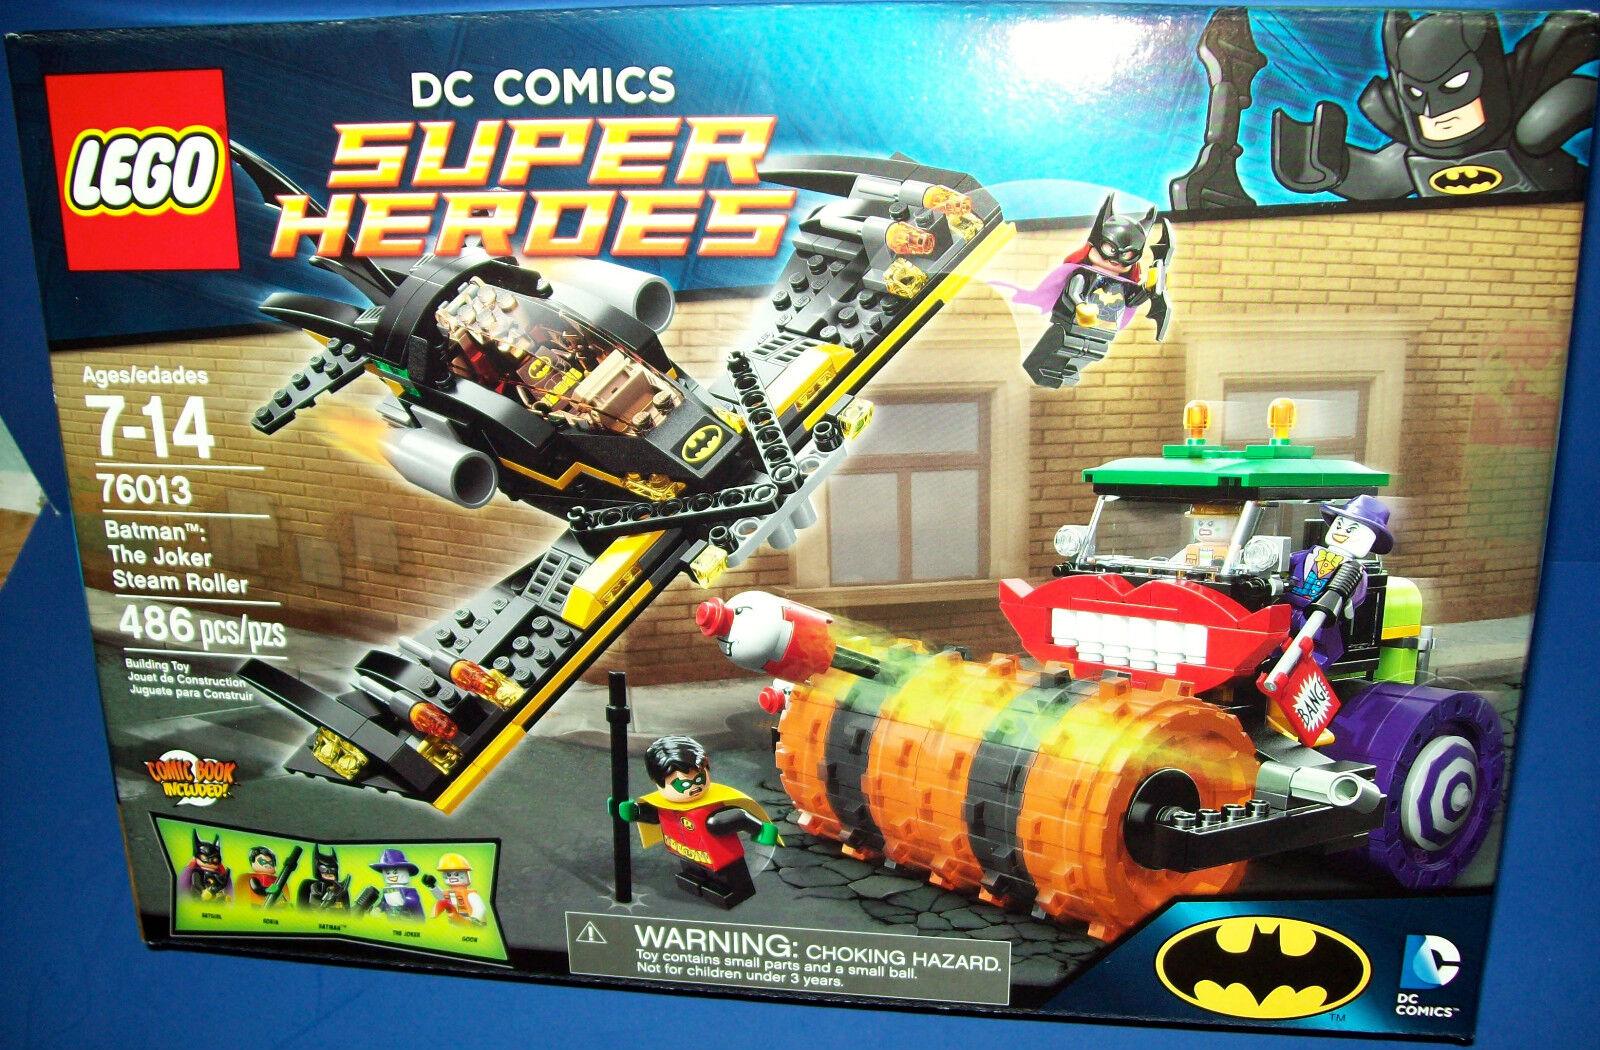 Lego 76013 Superhelden Dc Comics Batman The Joker Dampf Roller Nisb 5-figures